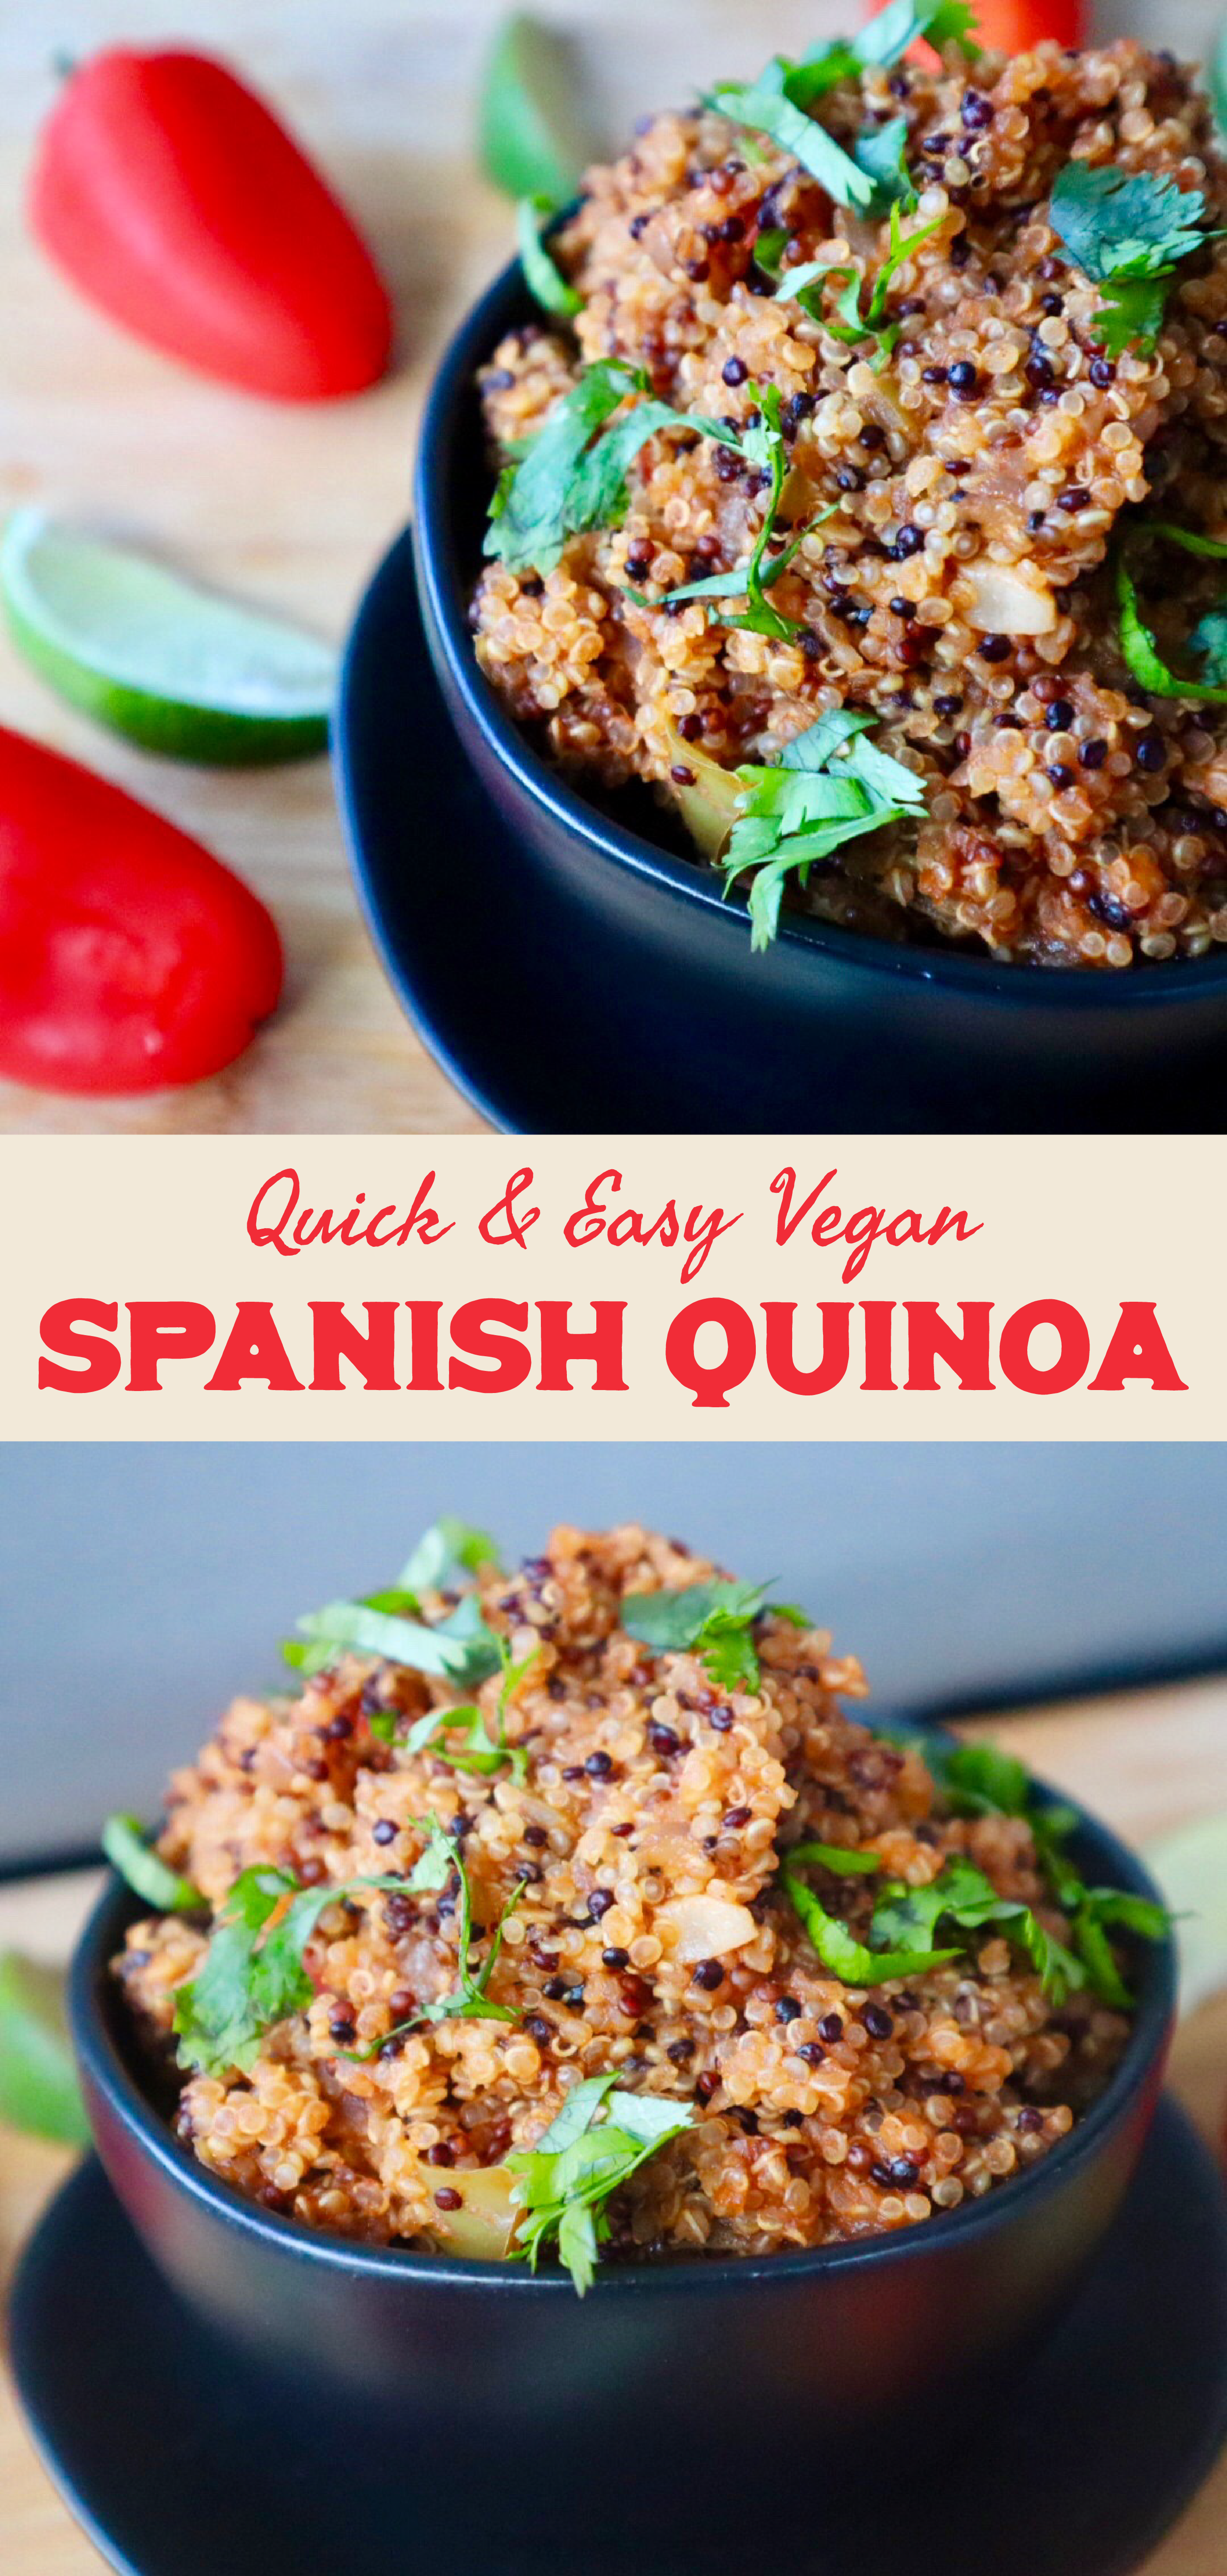 Spanish Quinoa New Vegan Heart Recipes Vegan Recipes